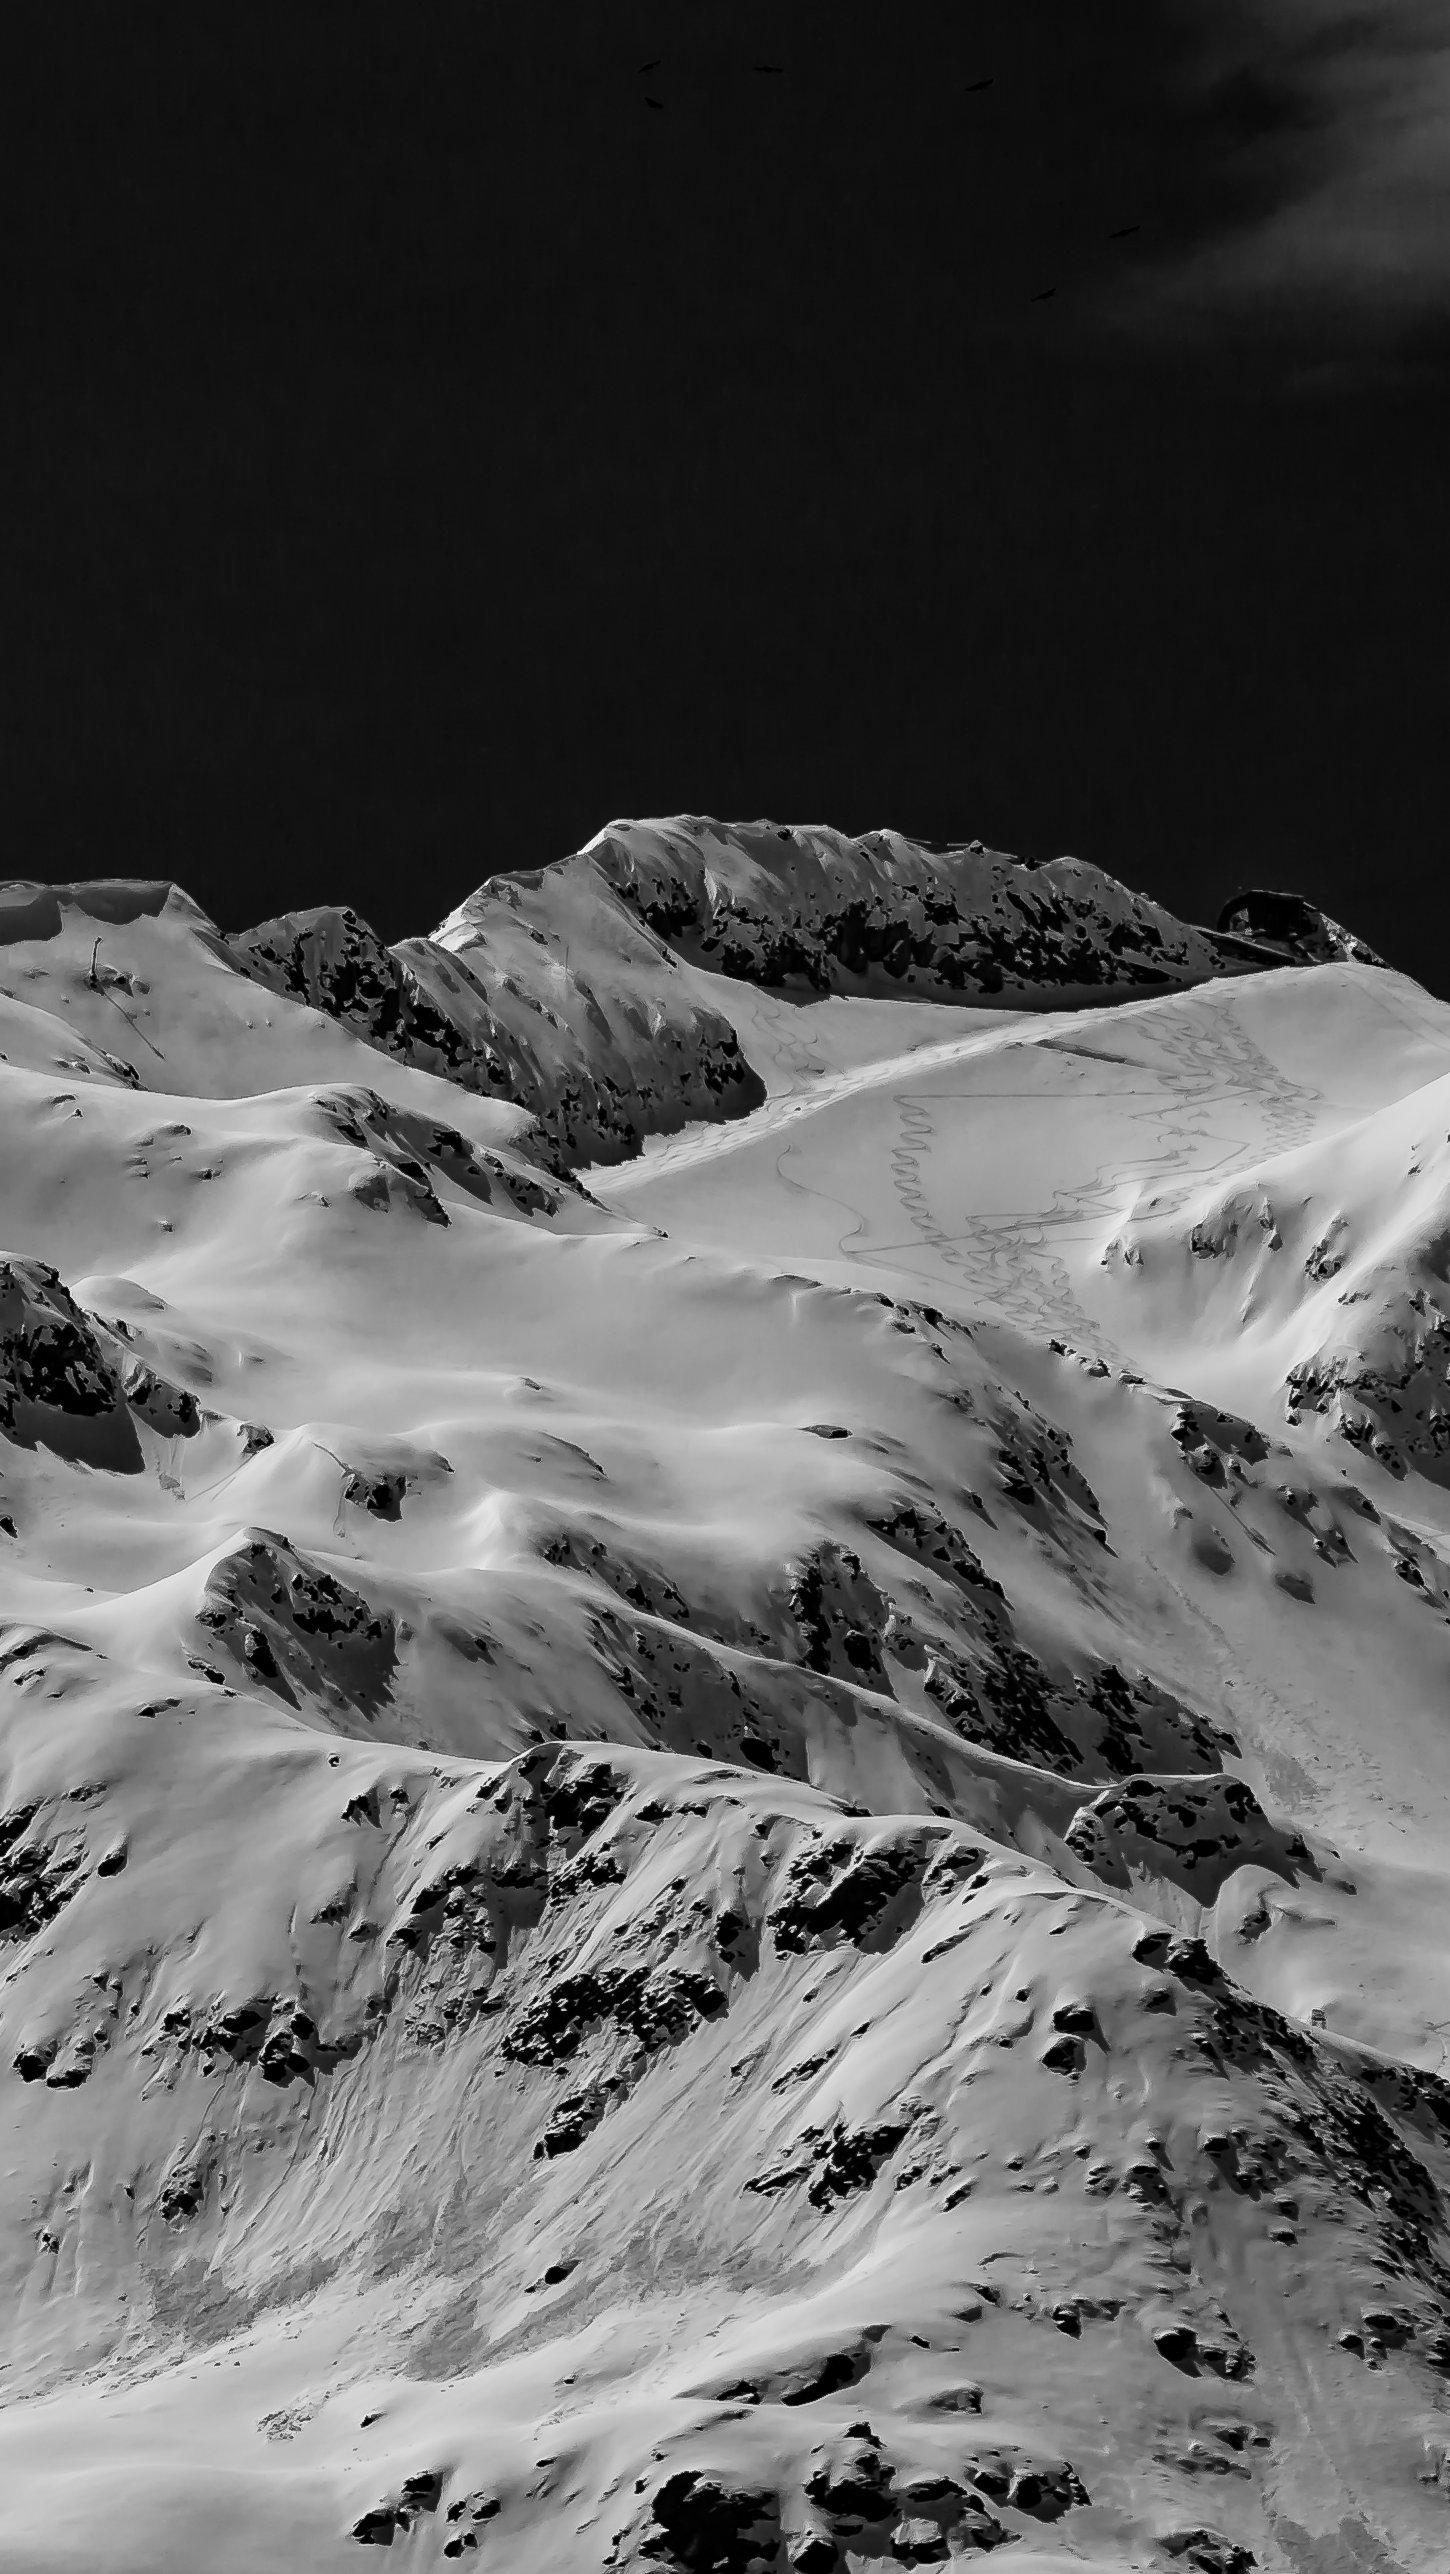 Wallpaper Gemsstock Switzerland Vertical